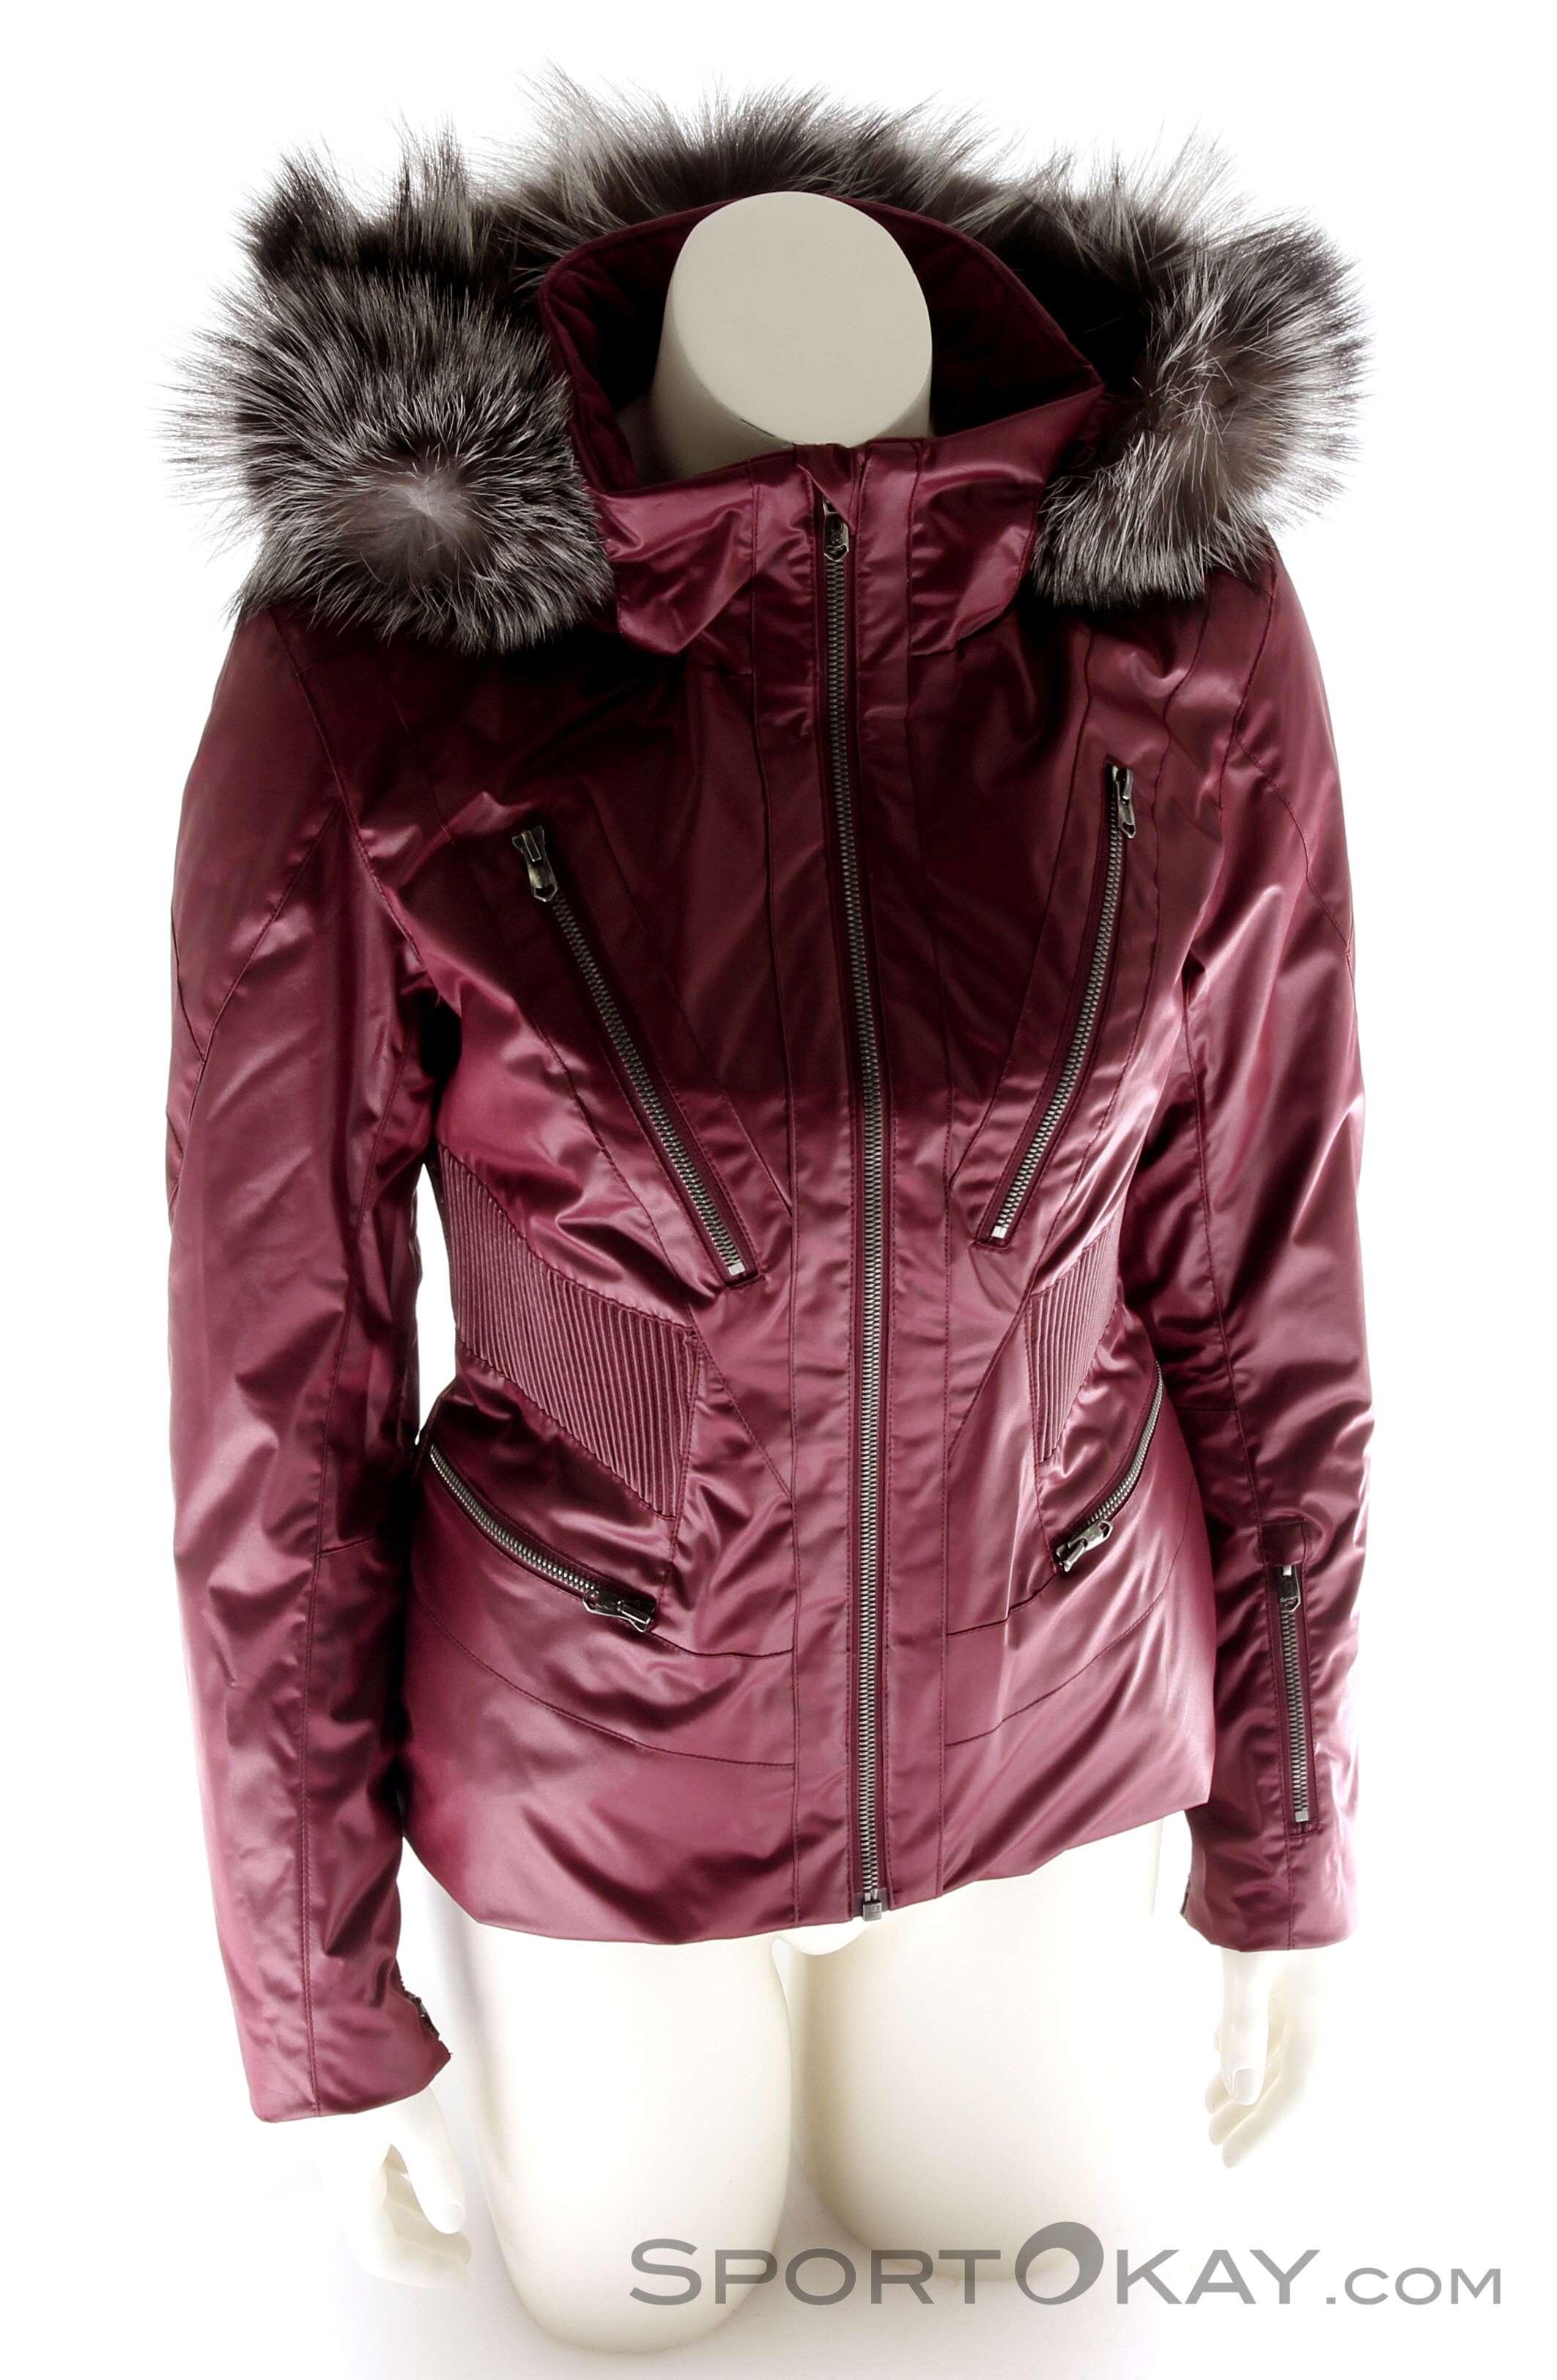 9ec46de1fd Spyder Women s Posh Jacket Womens Ski Jacket - Ski Jackets - Ski ...